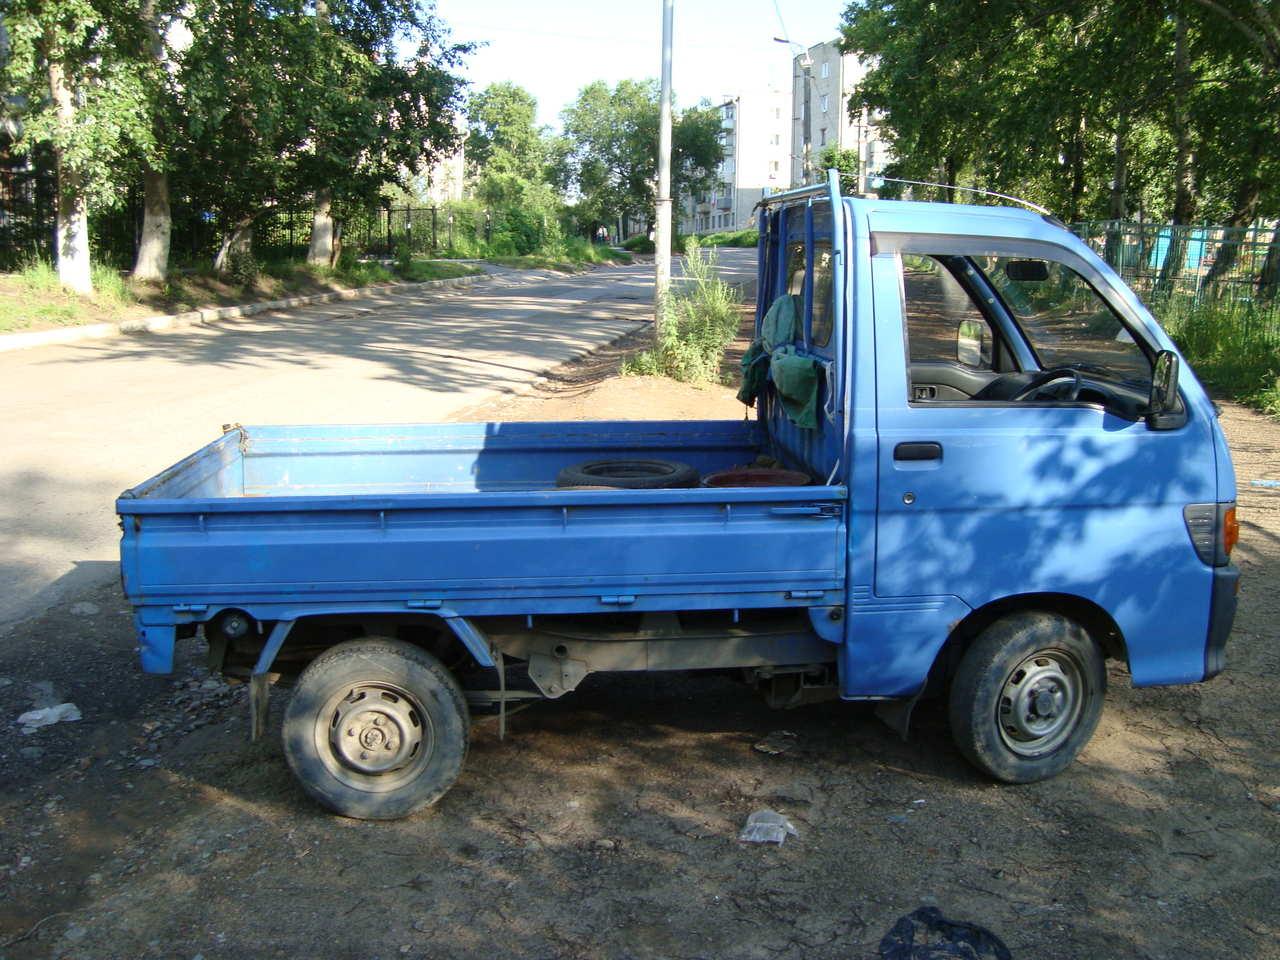 of daihatsu s other mini trucks 1995 daihatsu hijet pictures photo 2